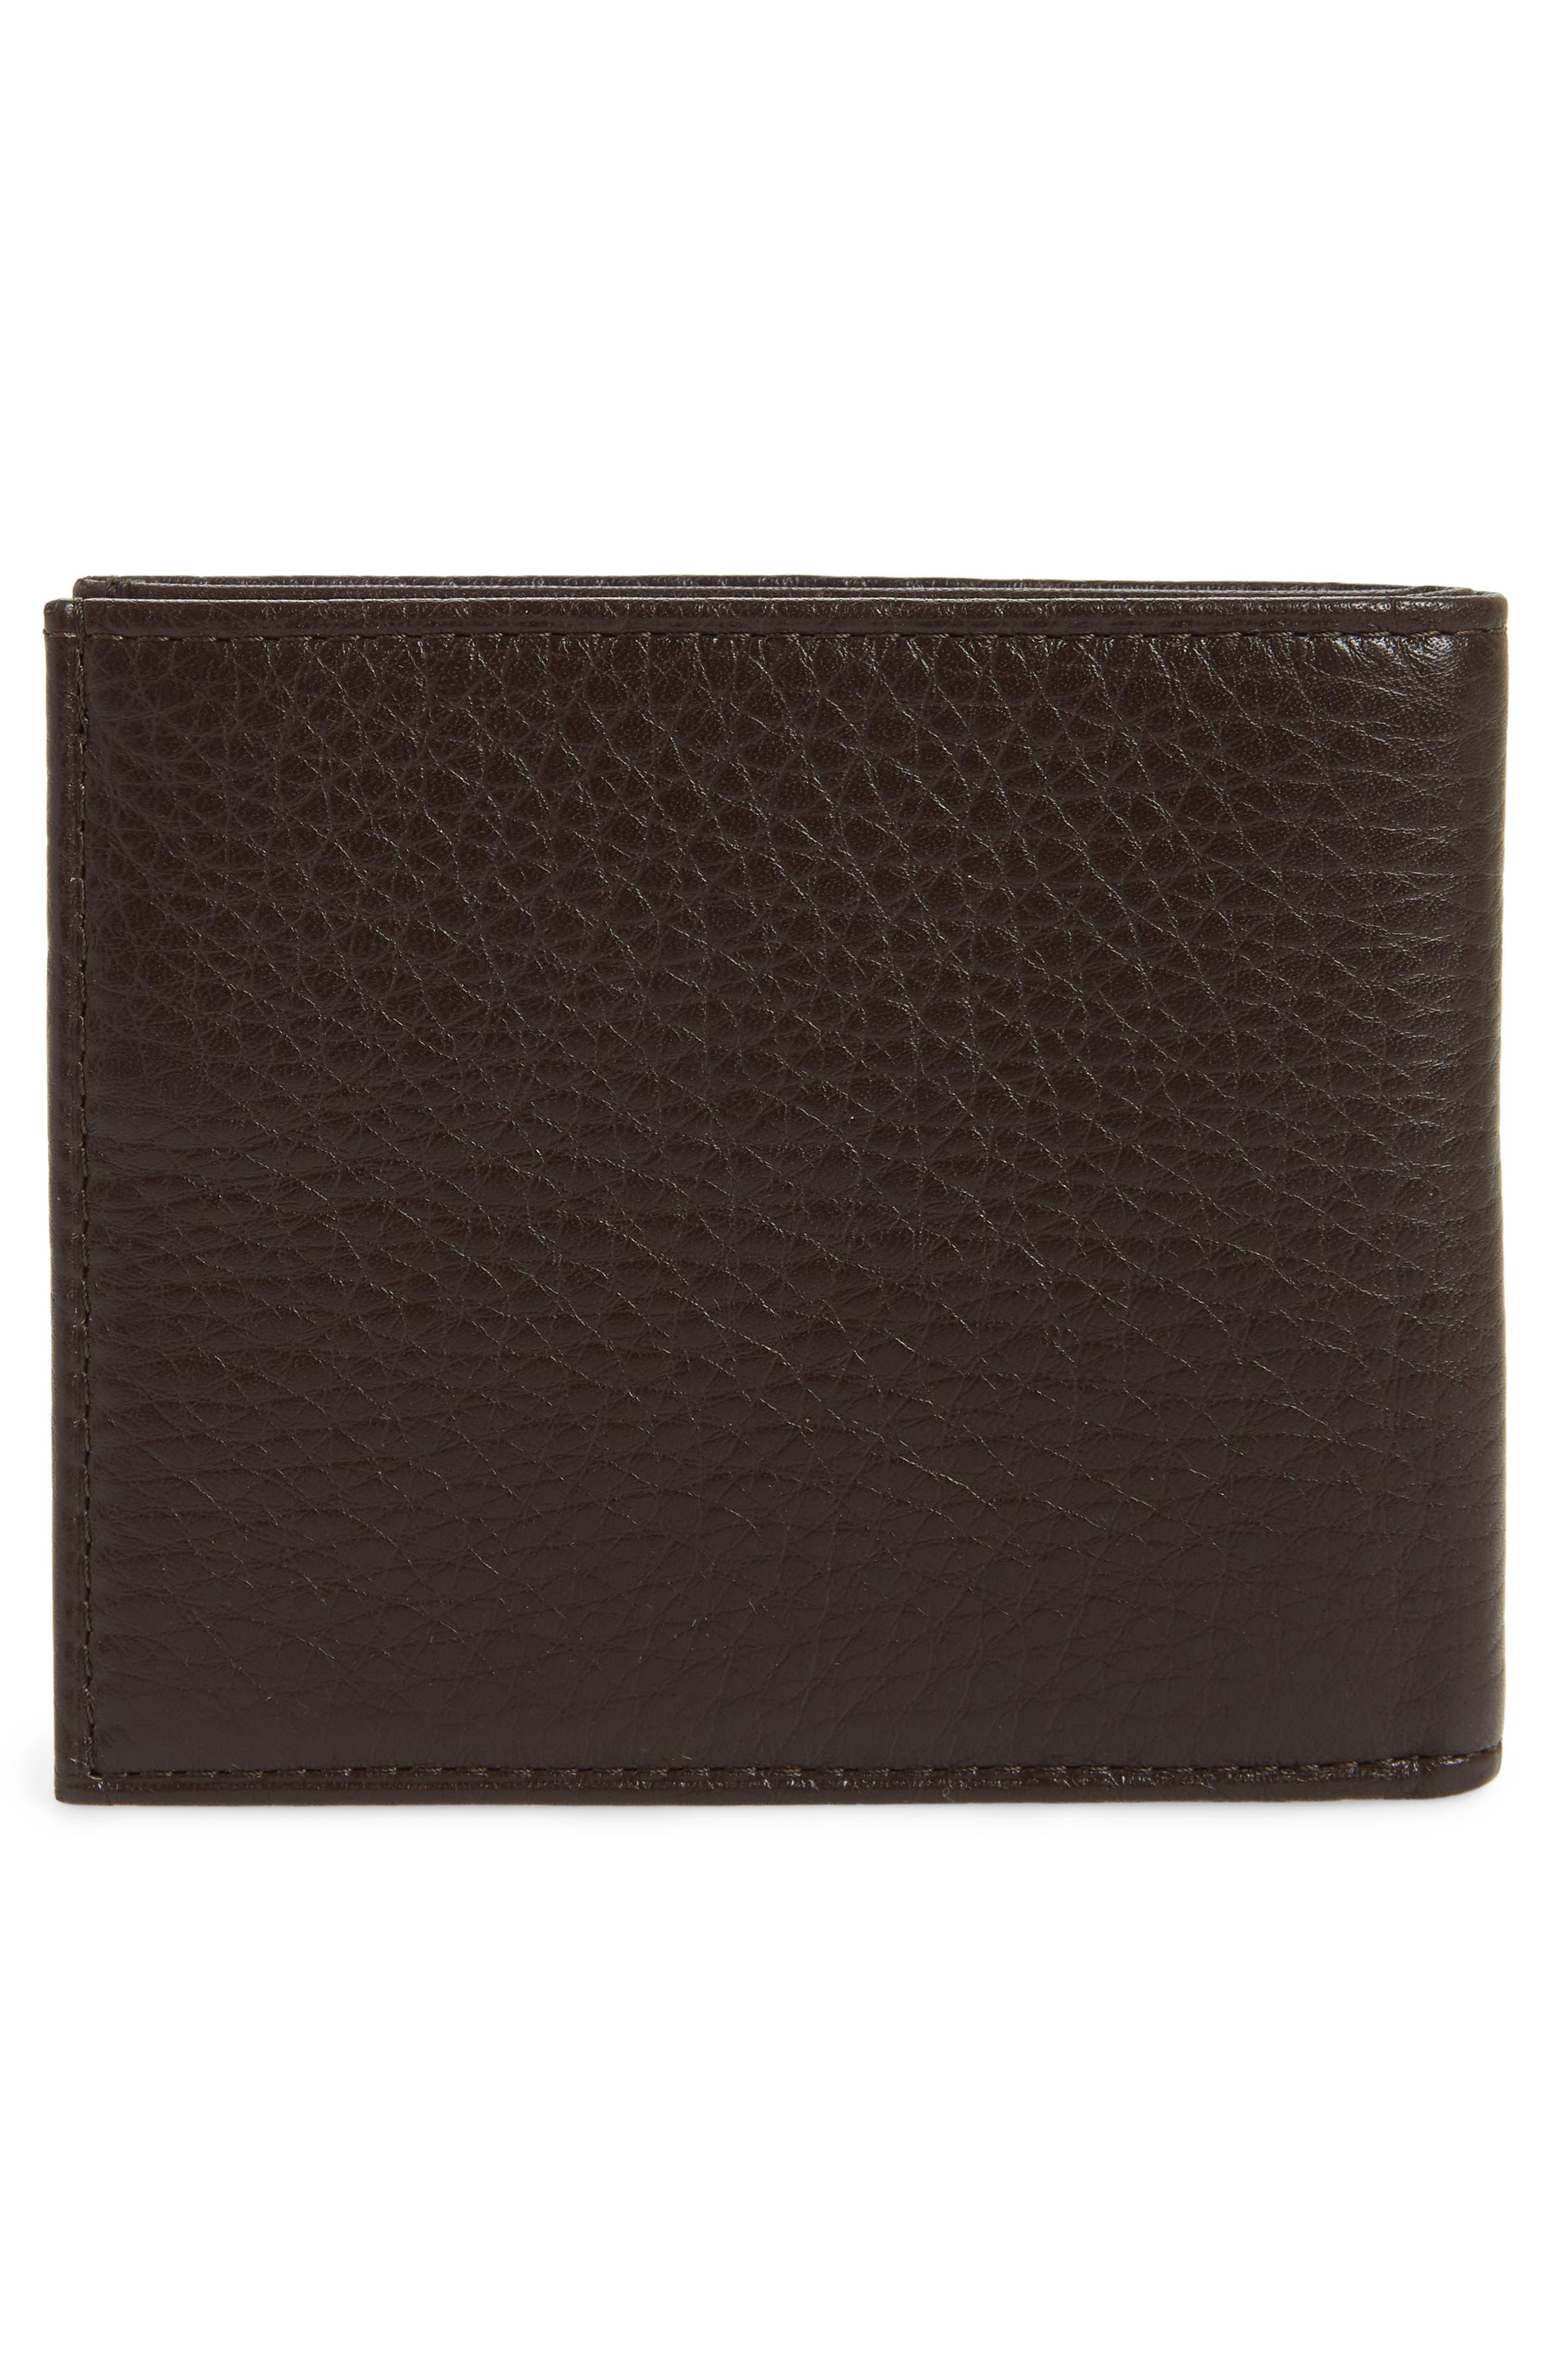 Alternate Image 3  - Polo Ralph Lauren Bifold Leather Wallet